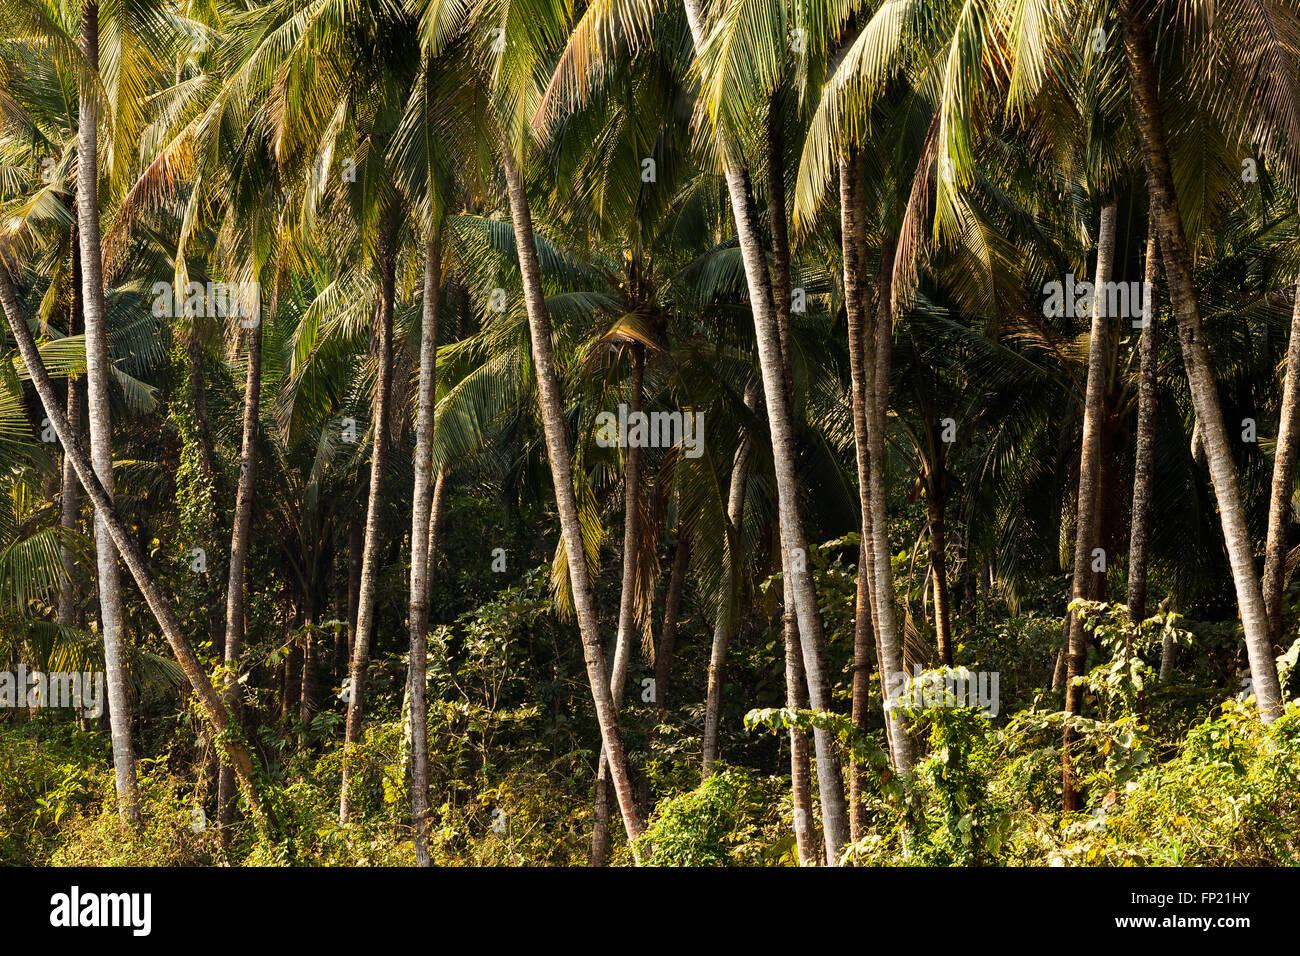 Cocotero jungle Imagen De Stock